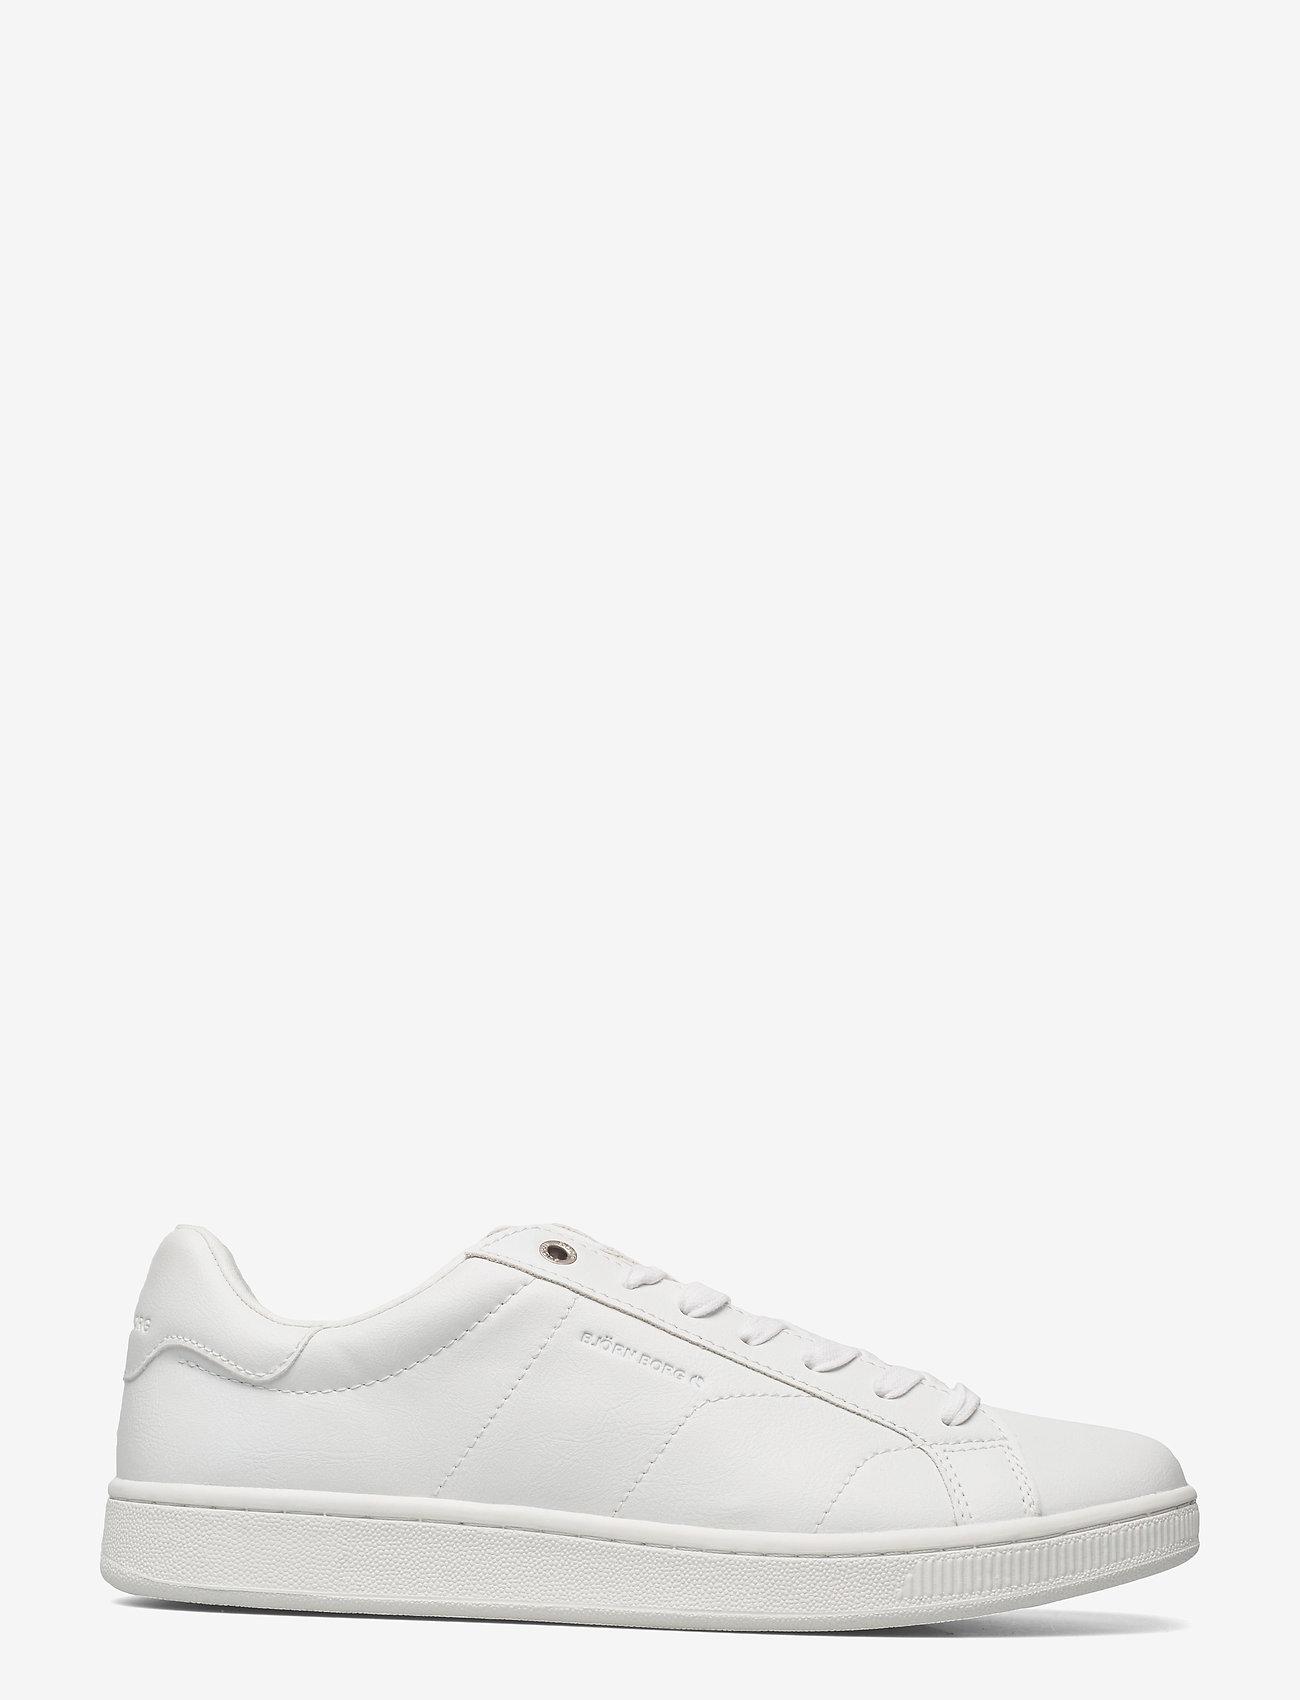 Björn Borg - T305 CLS BTM M - laag sneakers - white/white - 1